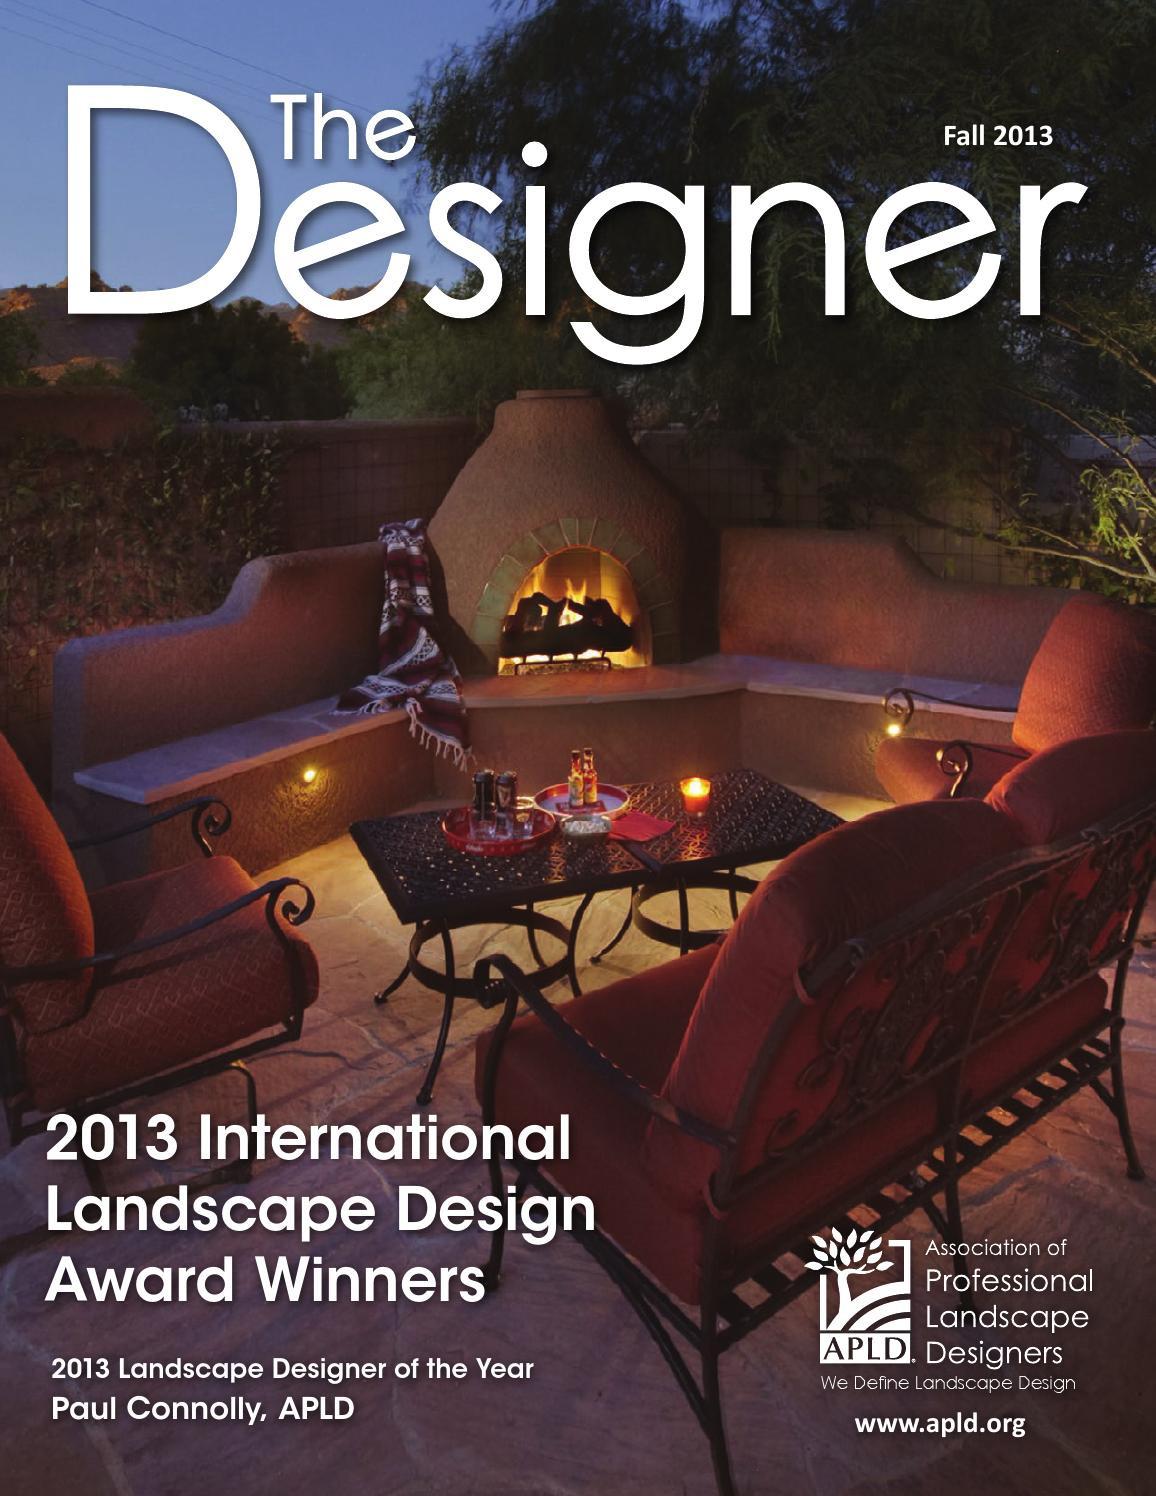 Association Of Professional Landscape Designers  ISSUU APLD The Designer Fall 2013 by Association of